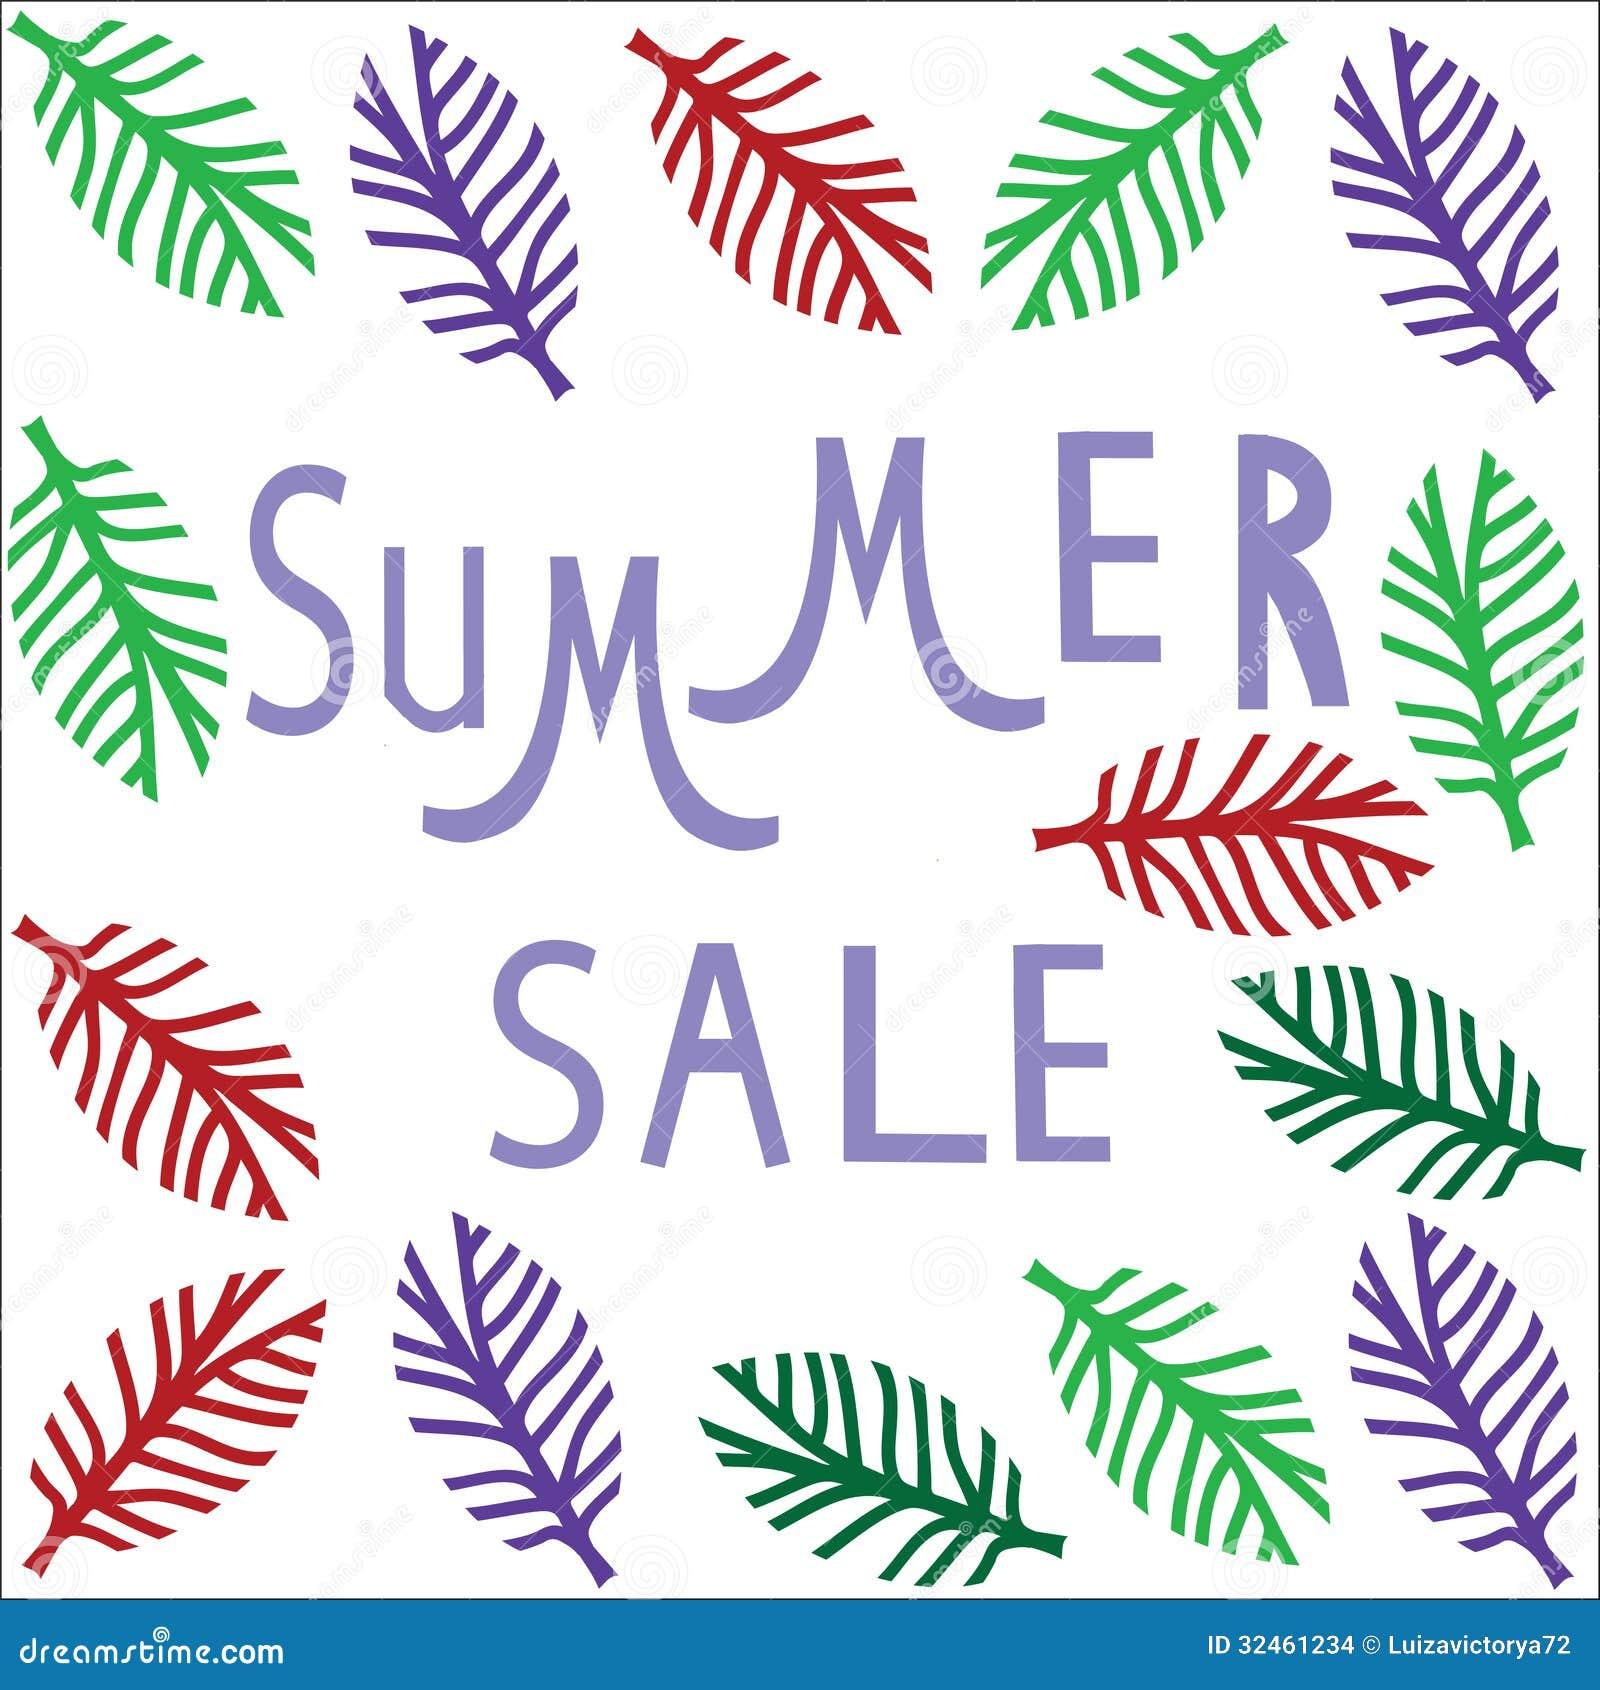 summer template summer fashion summe stock photo summer template summer fashion summe stock images